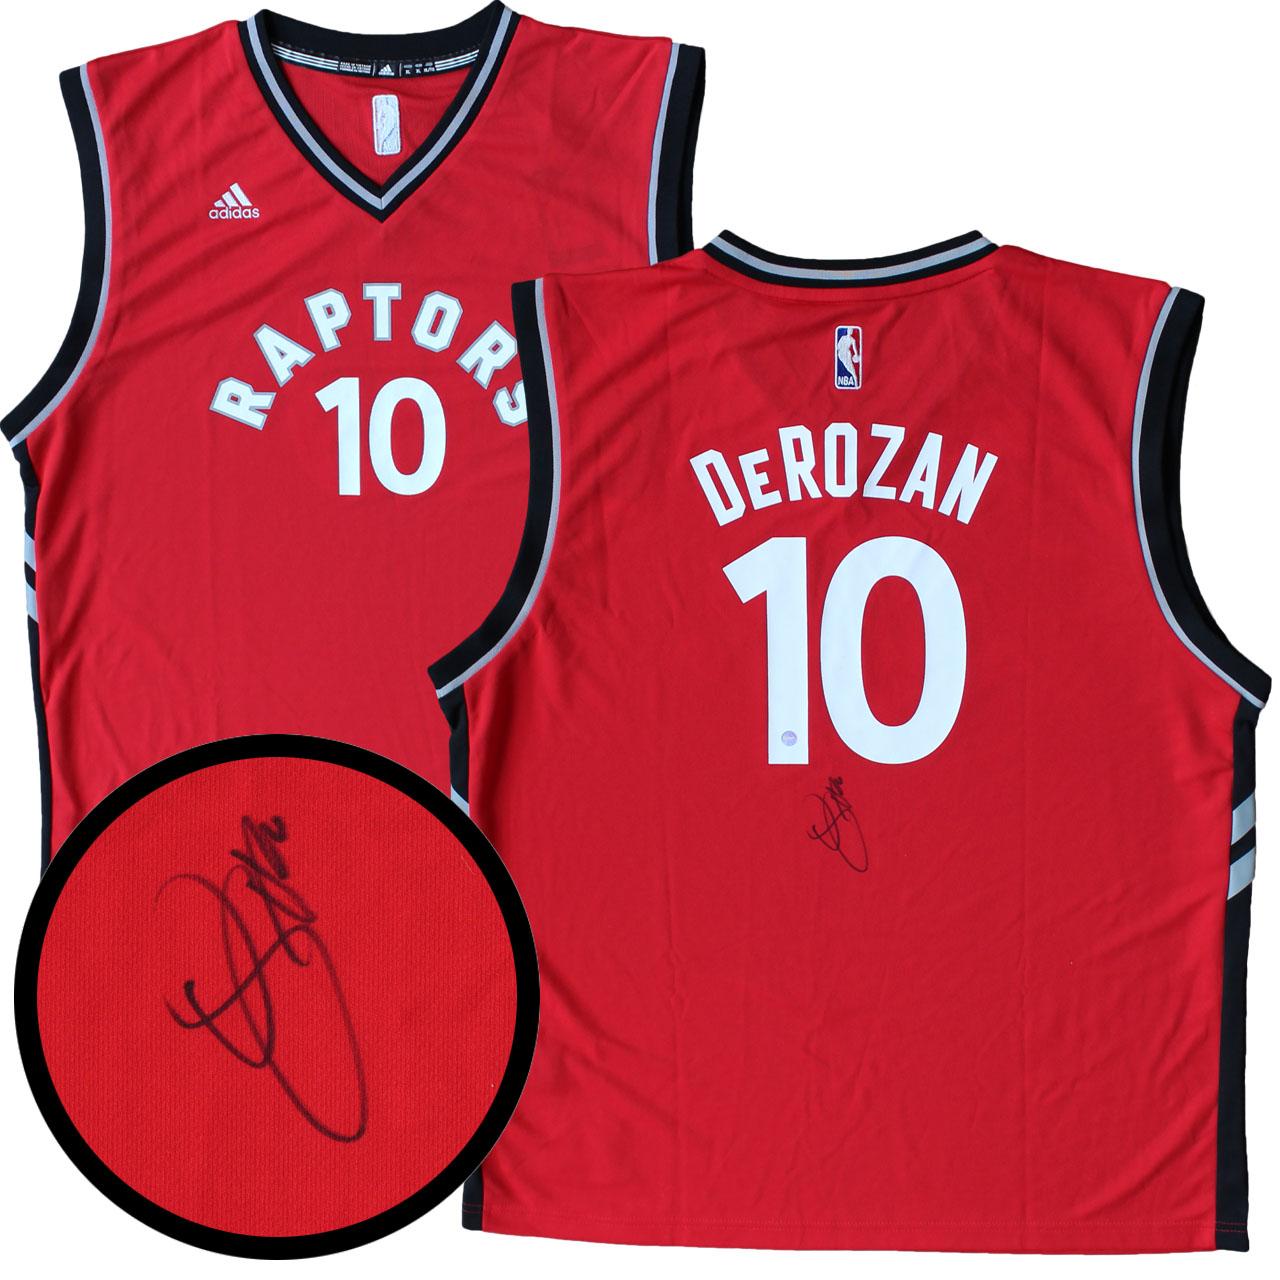 buy online 810b3 b64ef Item Detail - DeMar DeRozan Signed Jersey, Toronto Raptors ...